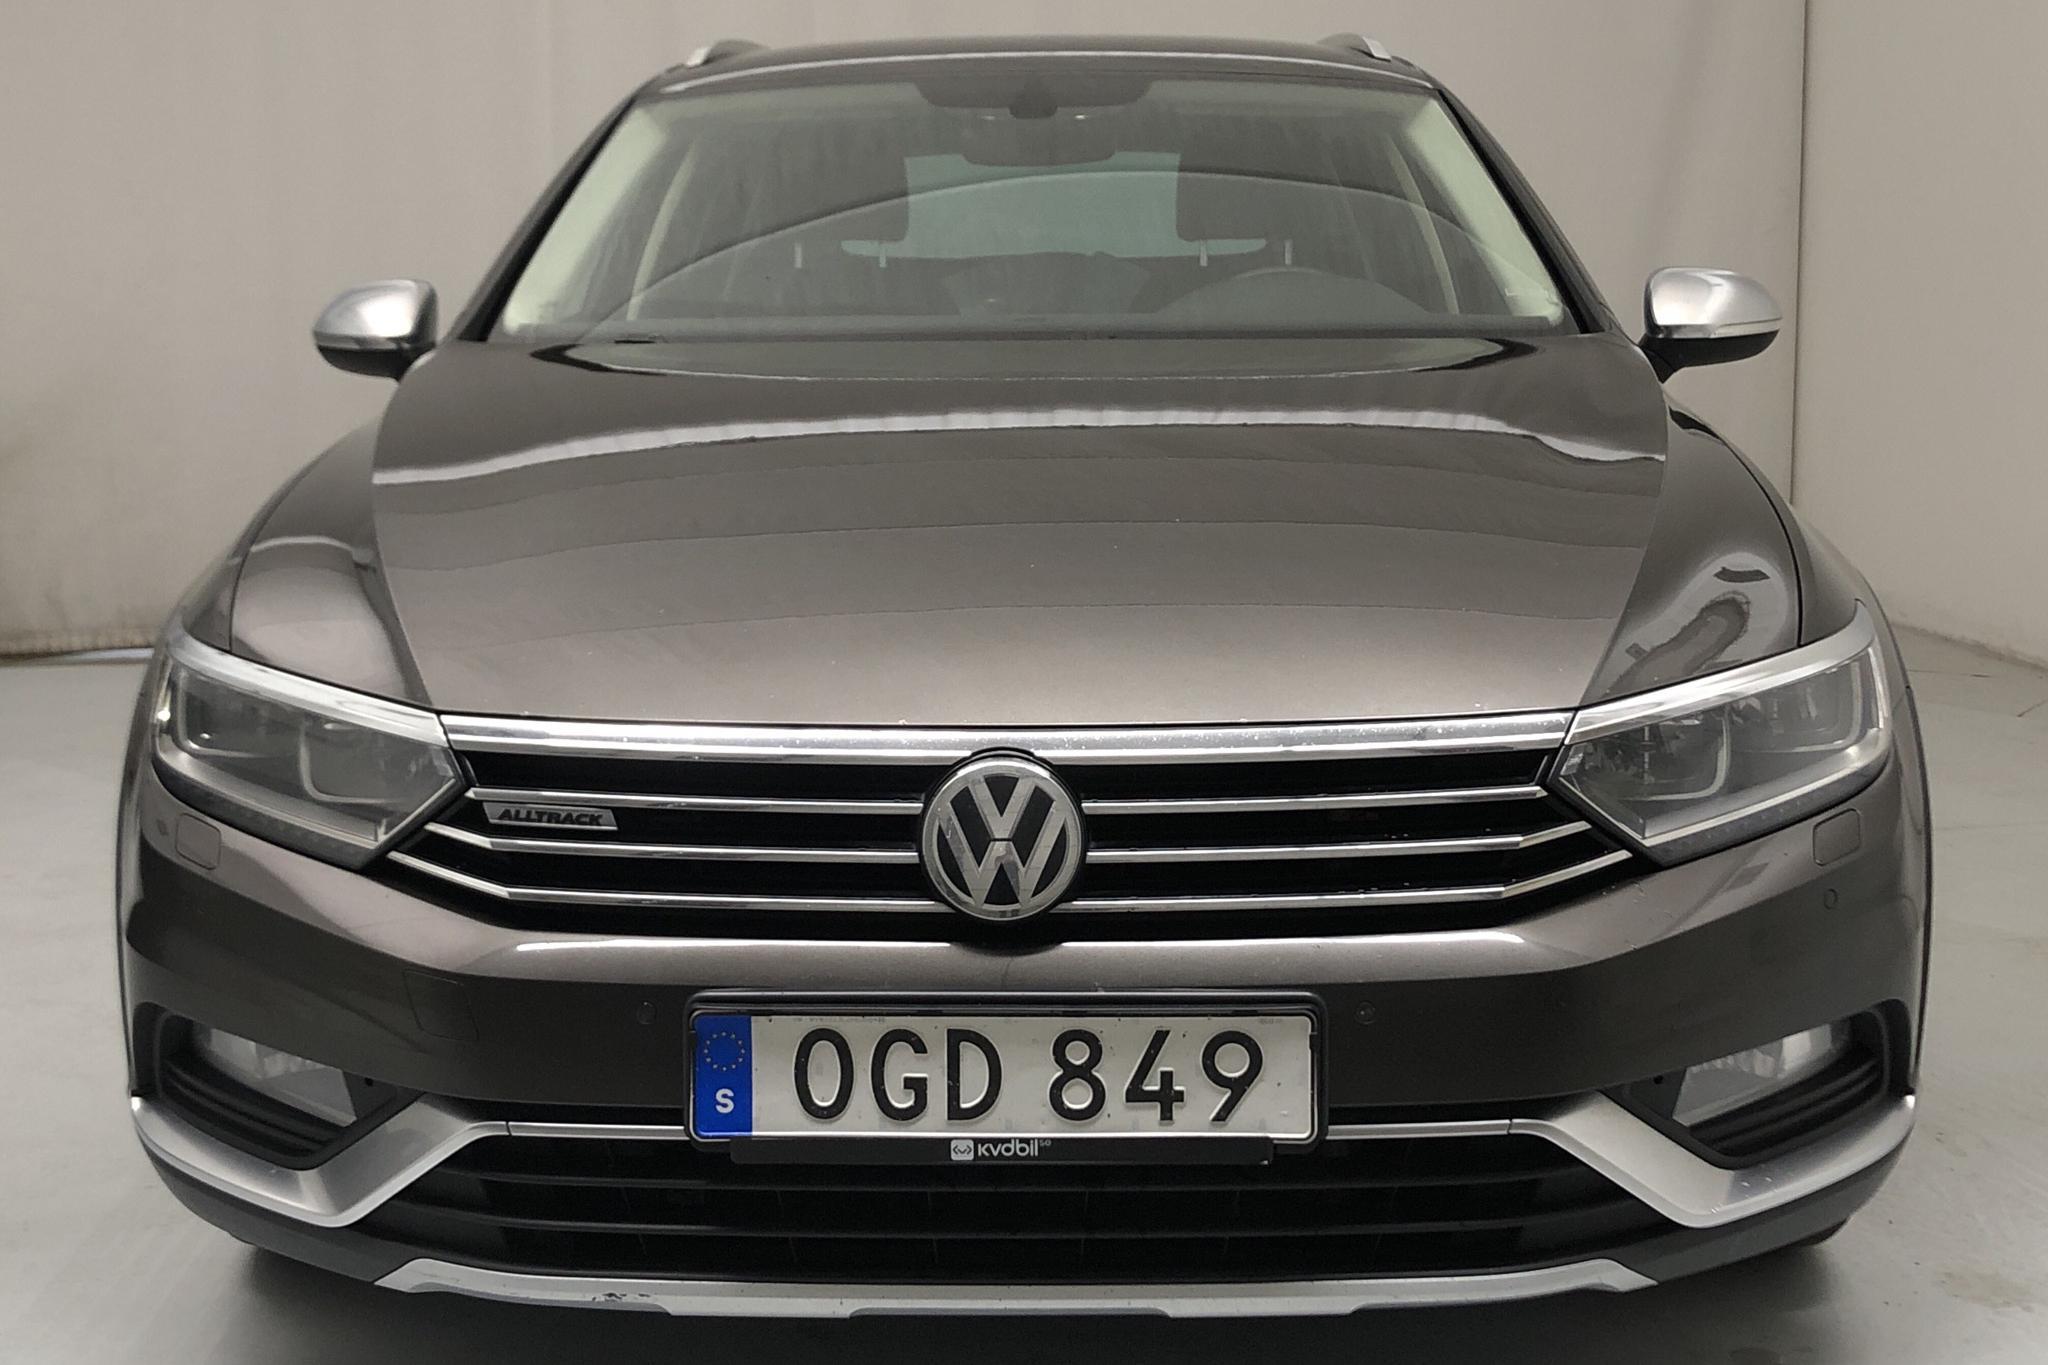 VW Passat Alltrack 2.0 TDI Sportscombi 4MOTION (190hk) - 254 360 km - Automatic - Dark Brown - 2017